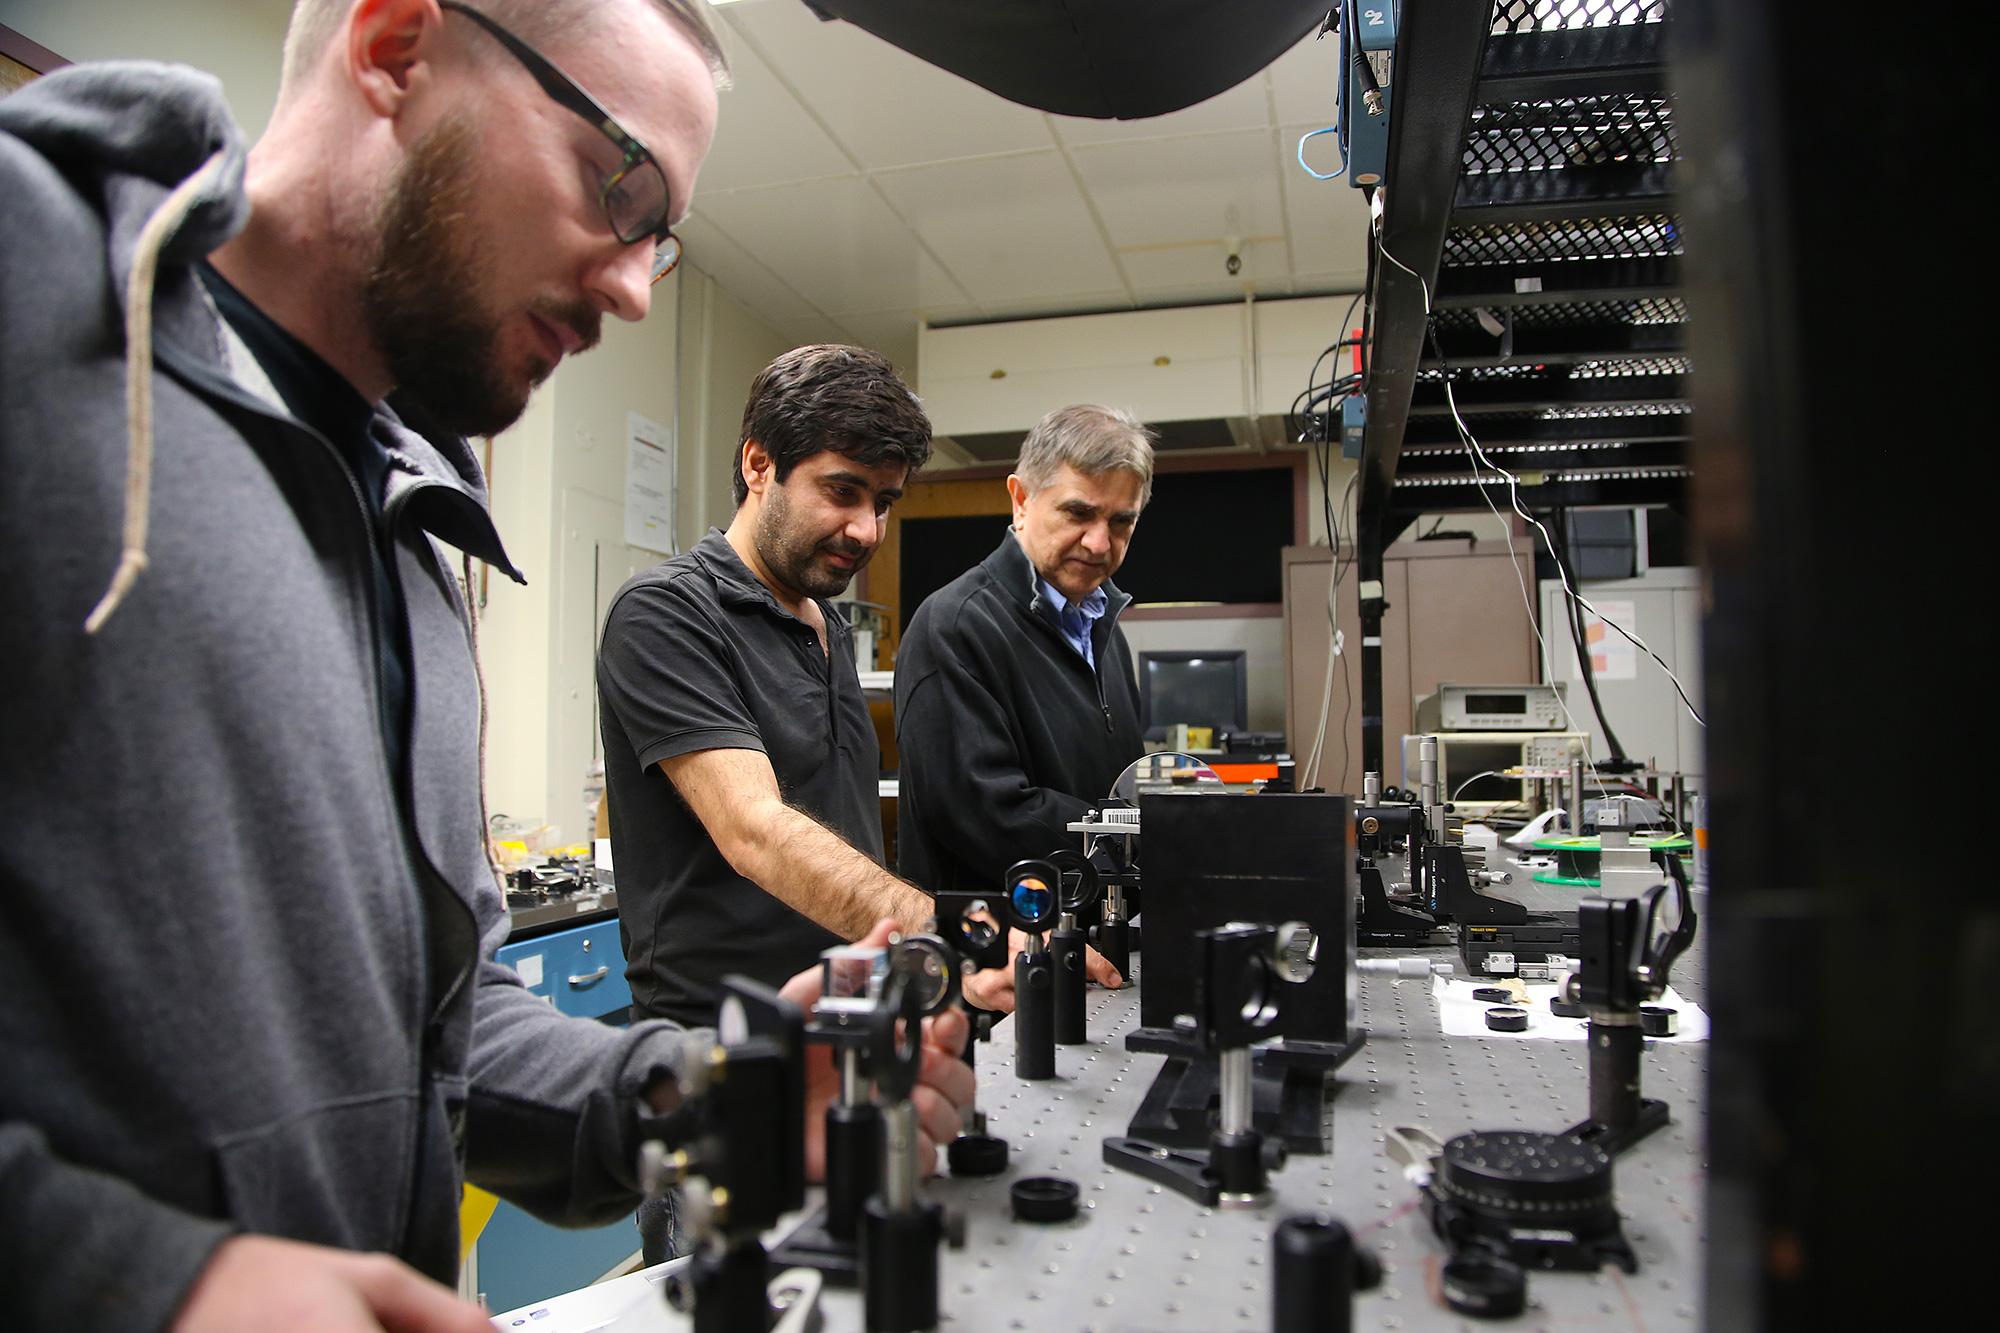 From left: Doctoral student Joshua Olsen, postdoctoral researcher Veyesi Demir, and professor and inventor Nasser Peyghambarian.